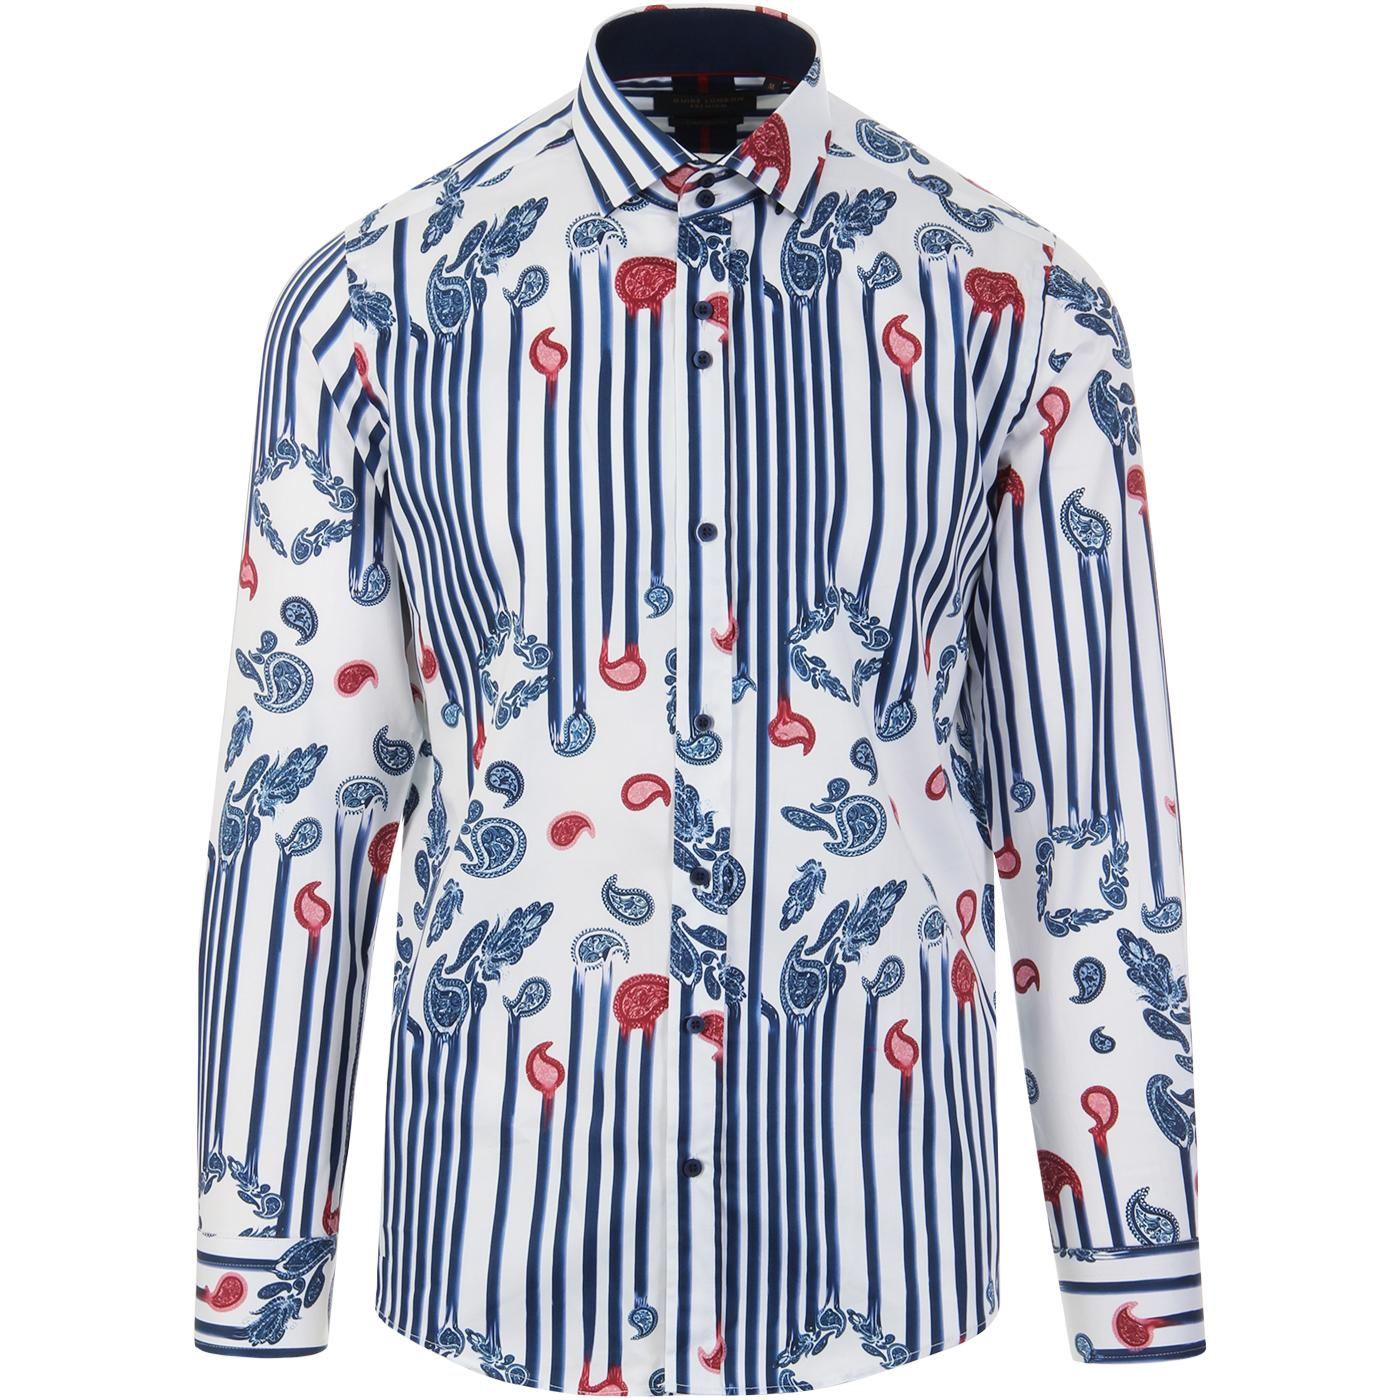 GUIDE LONDON Retro Mod Paisley Stripe Shirt